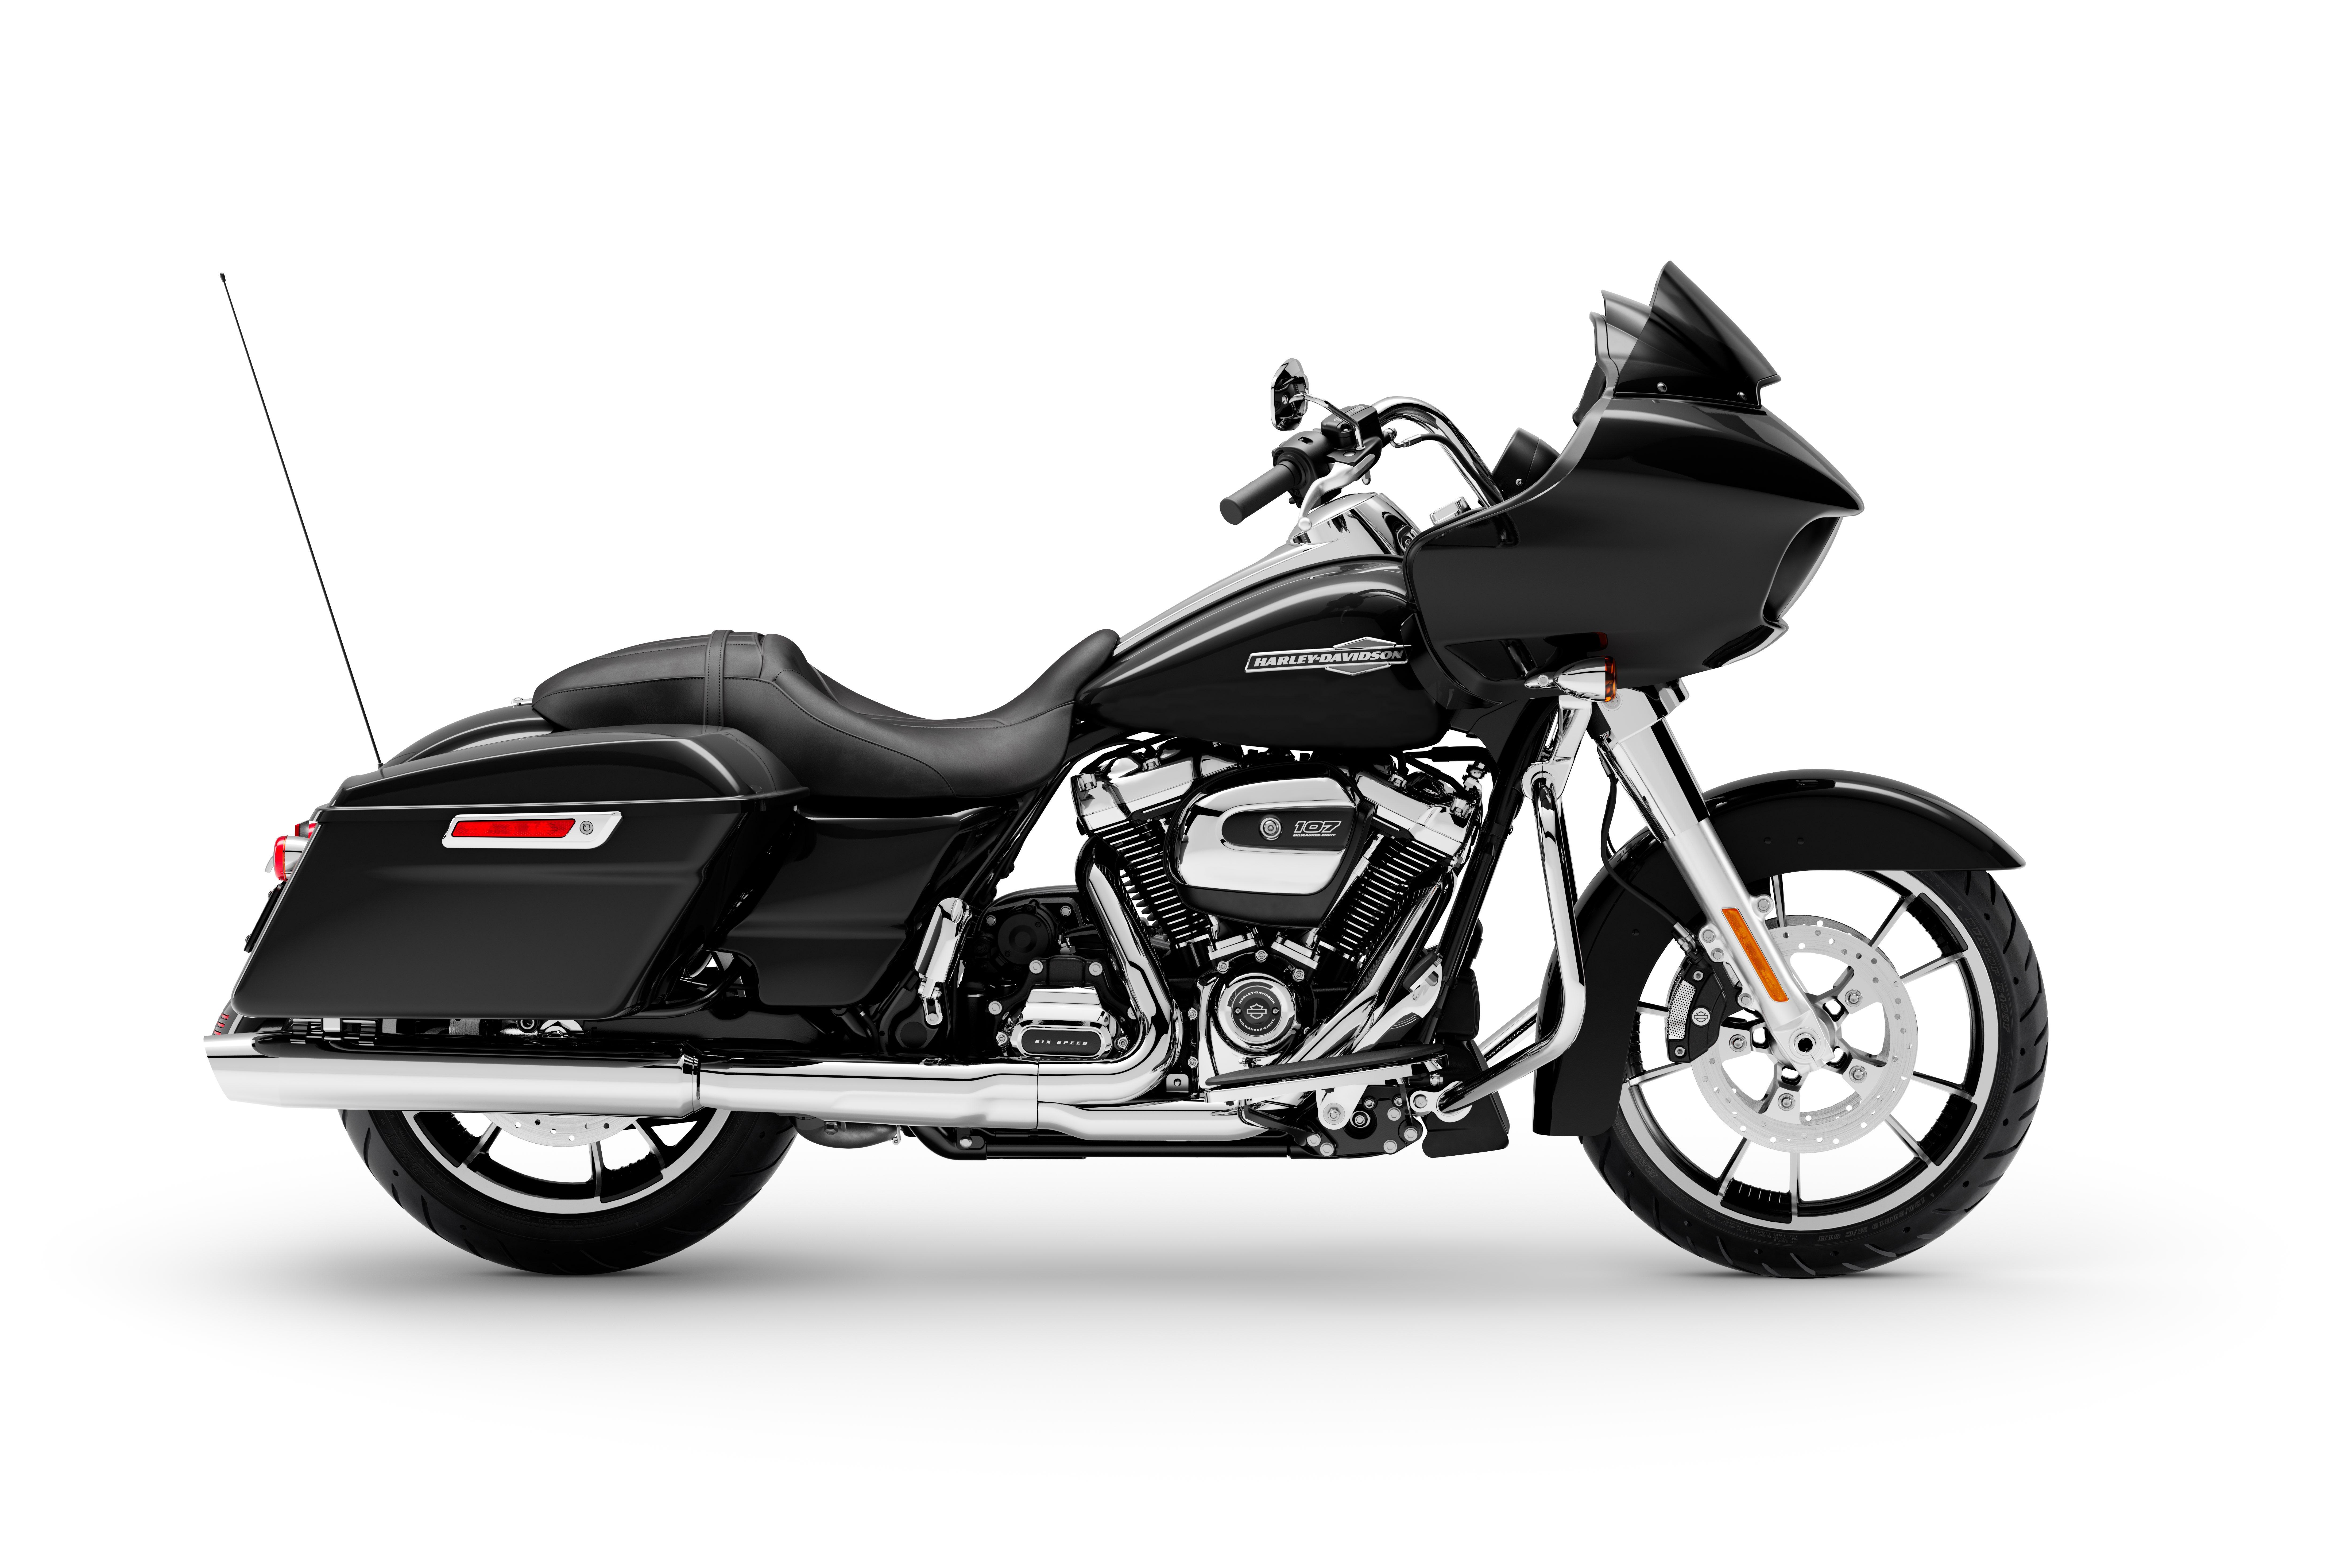 2021 Harley-Davidson Road Glide Custom [17]